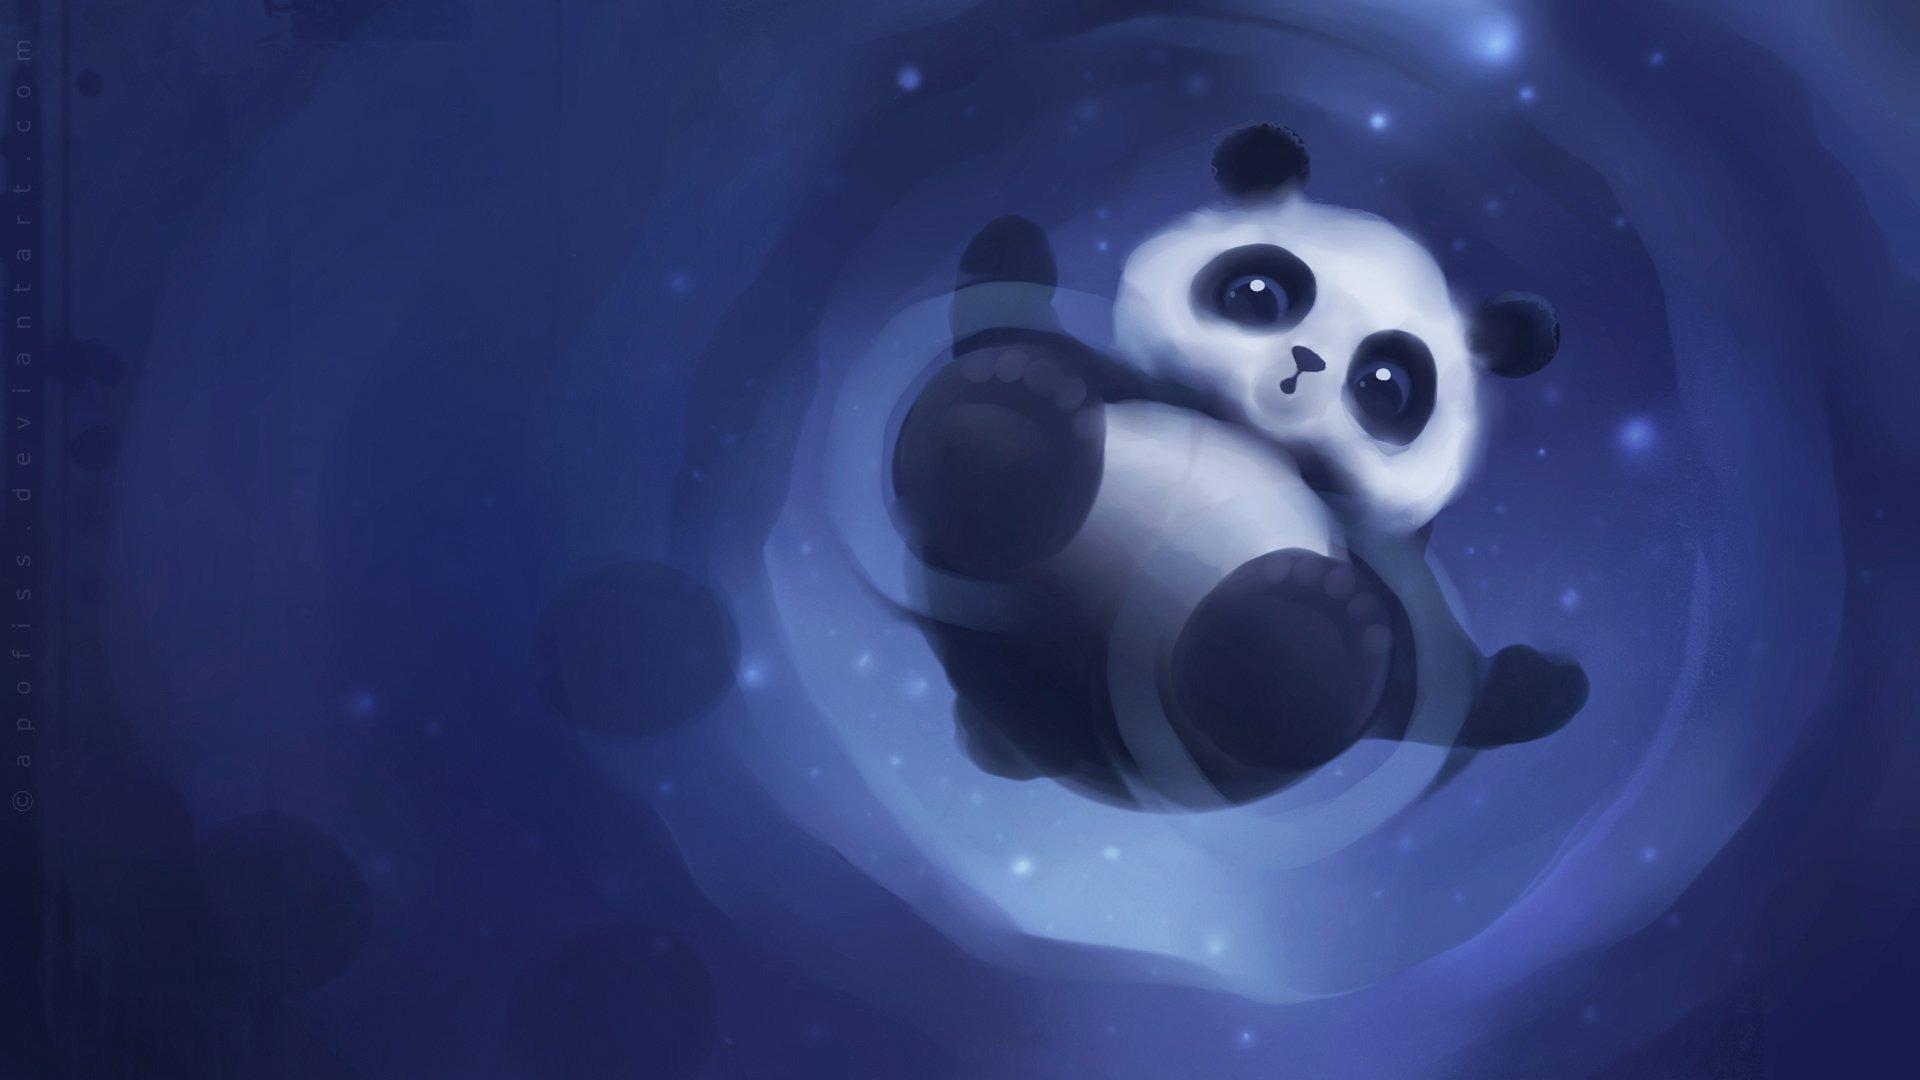 Panda Paper By Apofiss 1920x1080 Download 10wallpaper Com